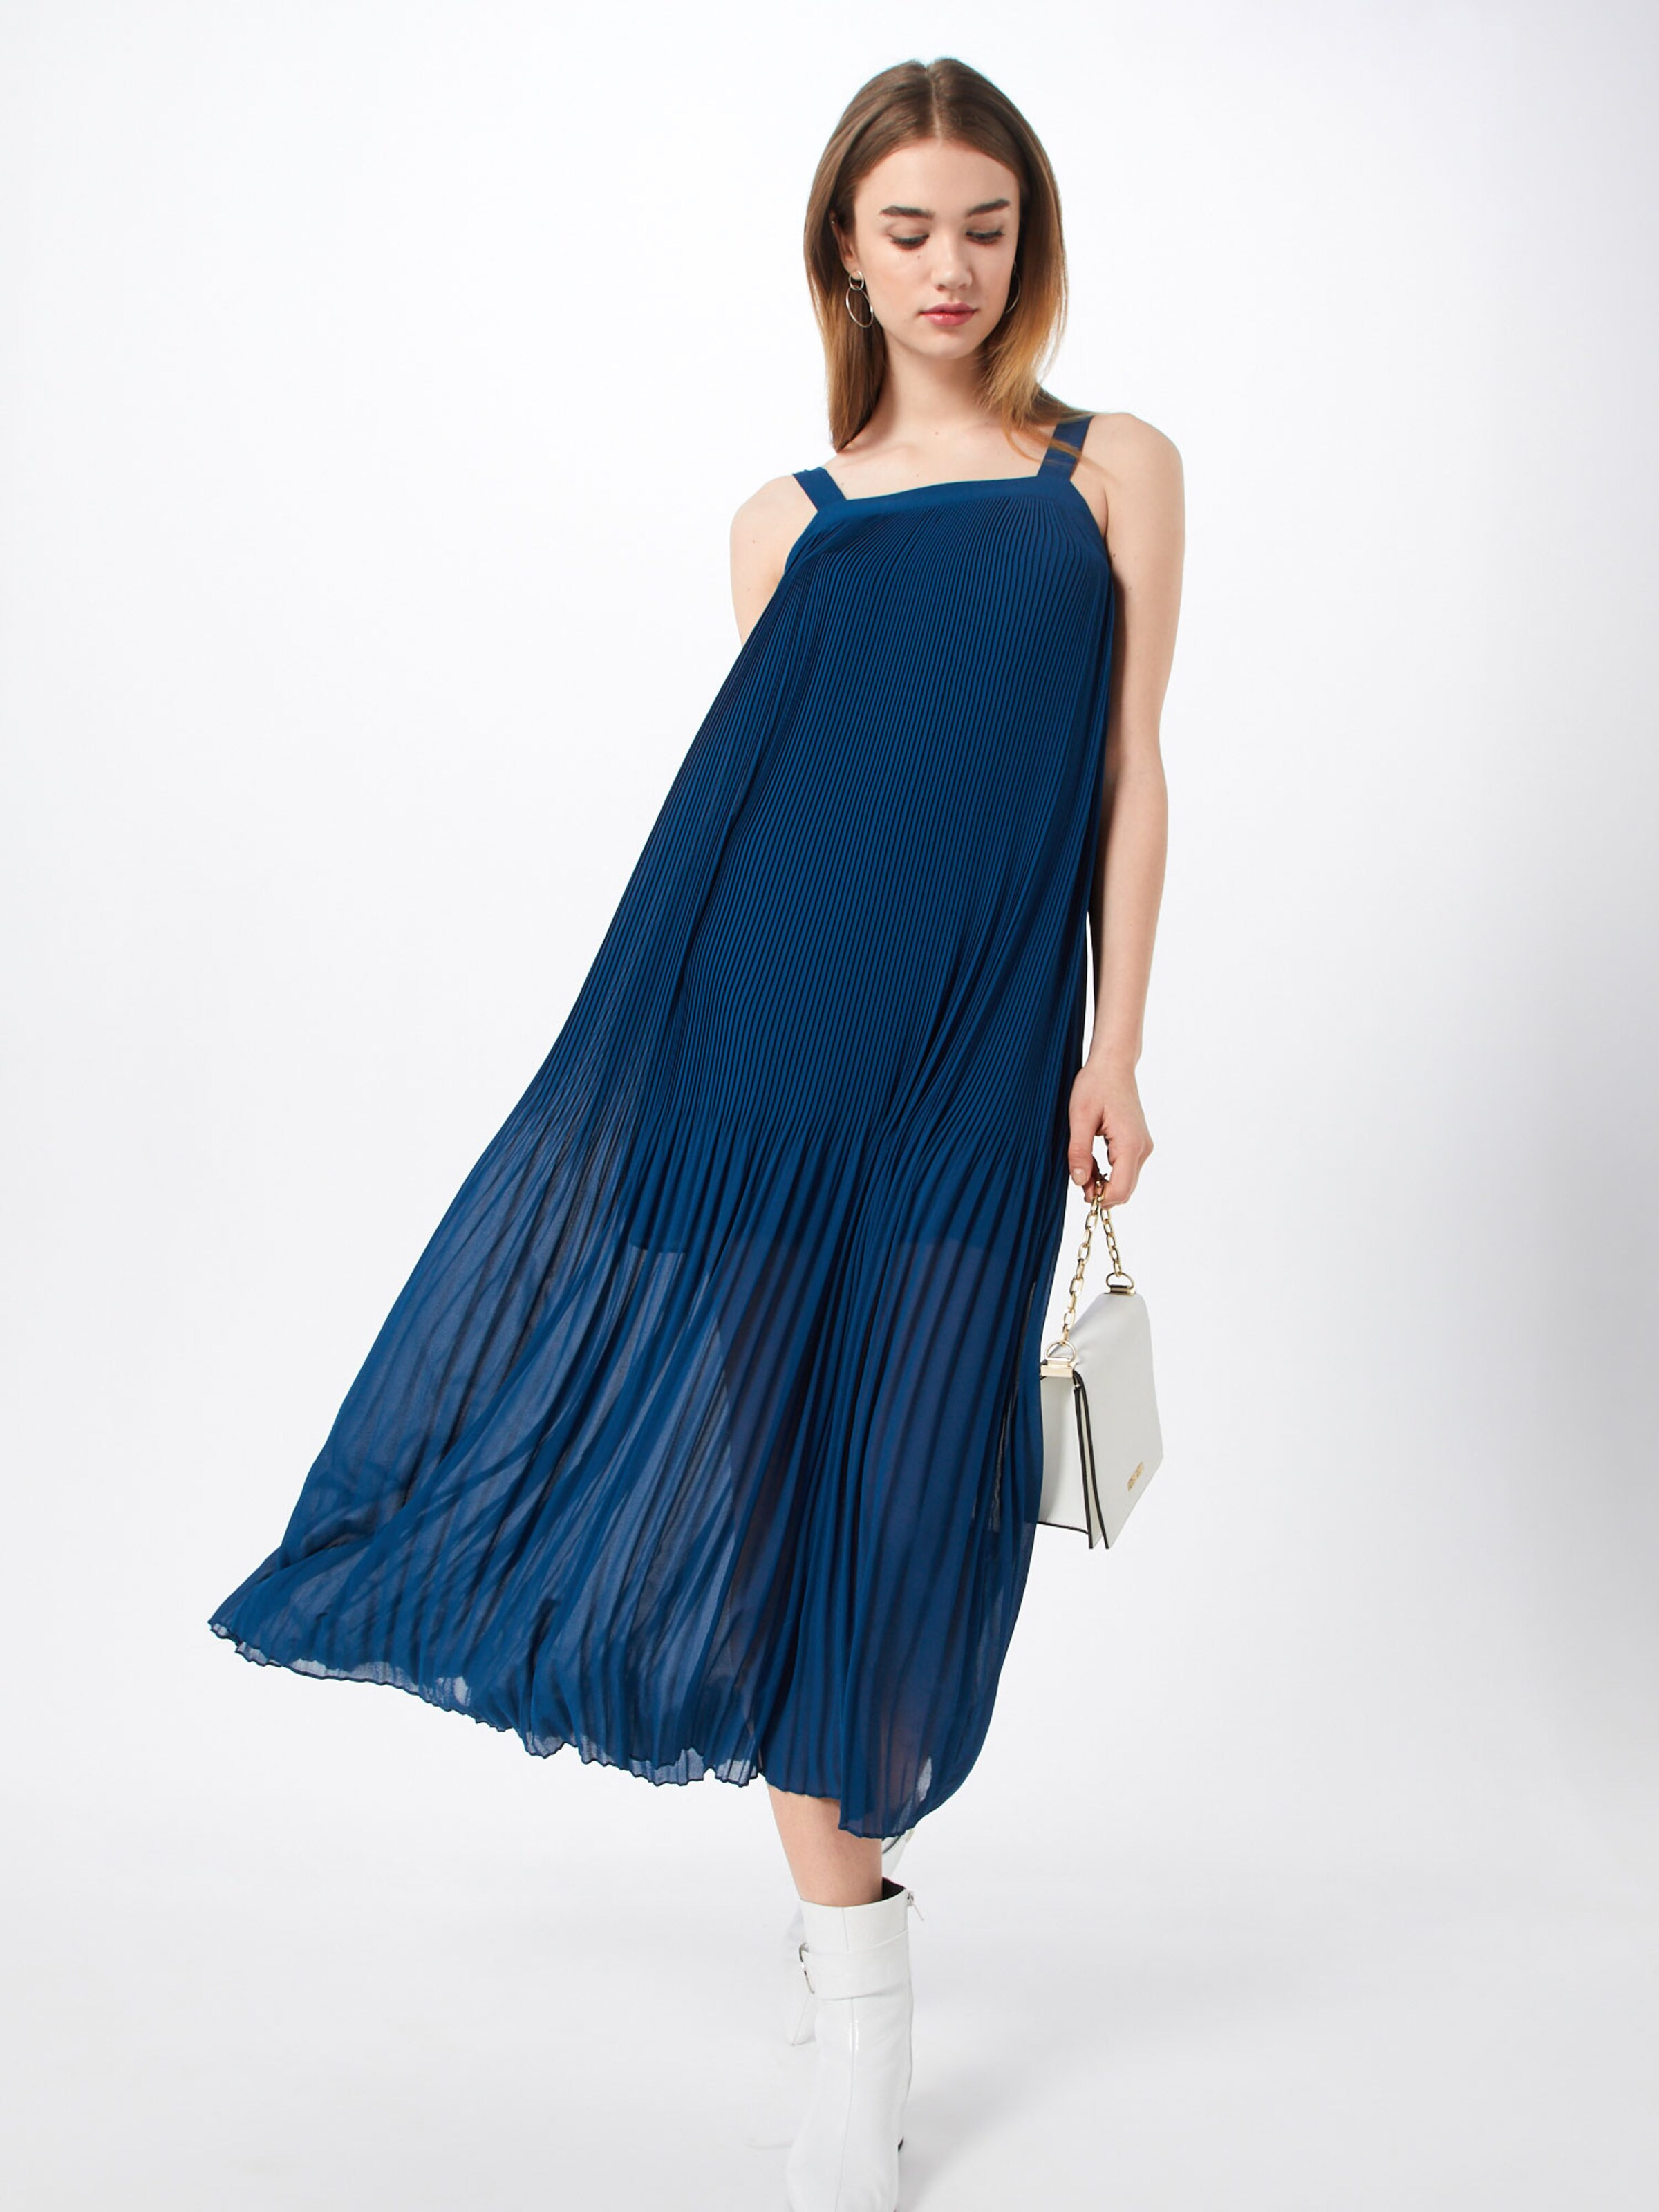 Robe 'rimini' 'rimini' Robe Bleu En Samsoeamp; Samsoeamp; QCsdtxhr